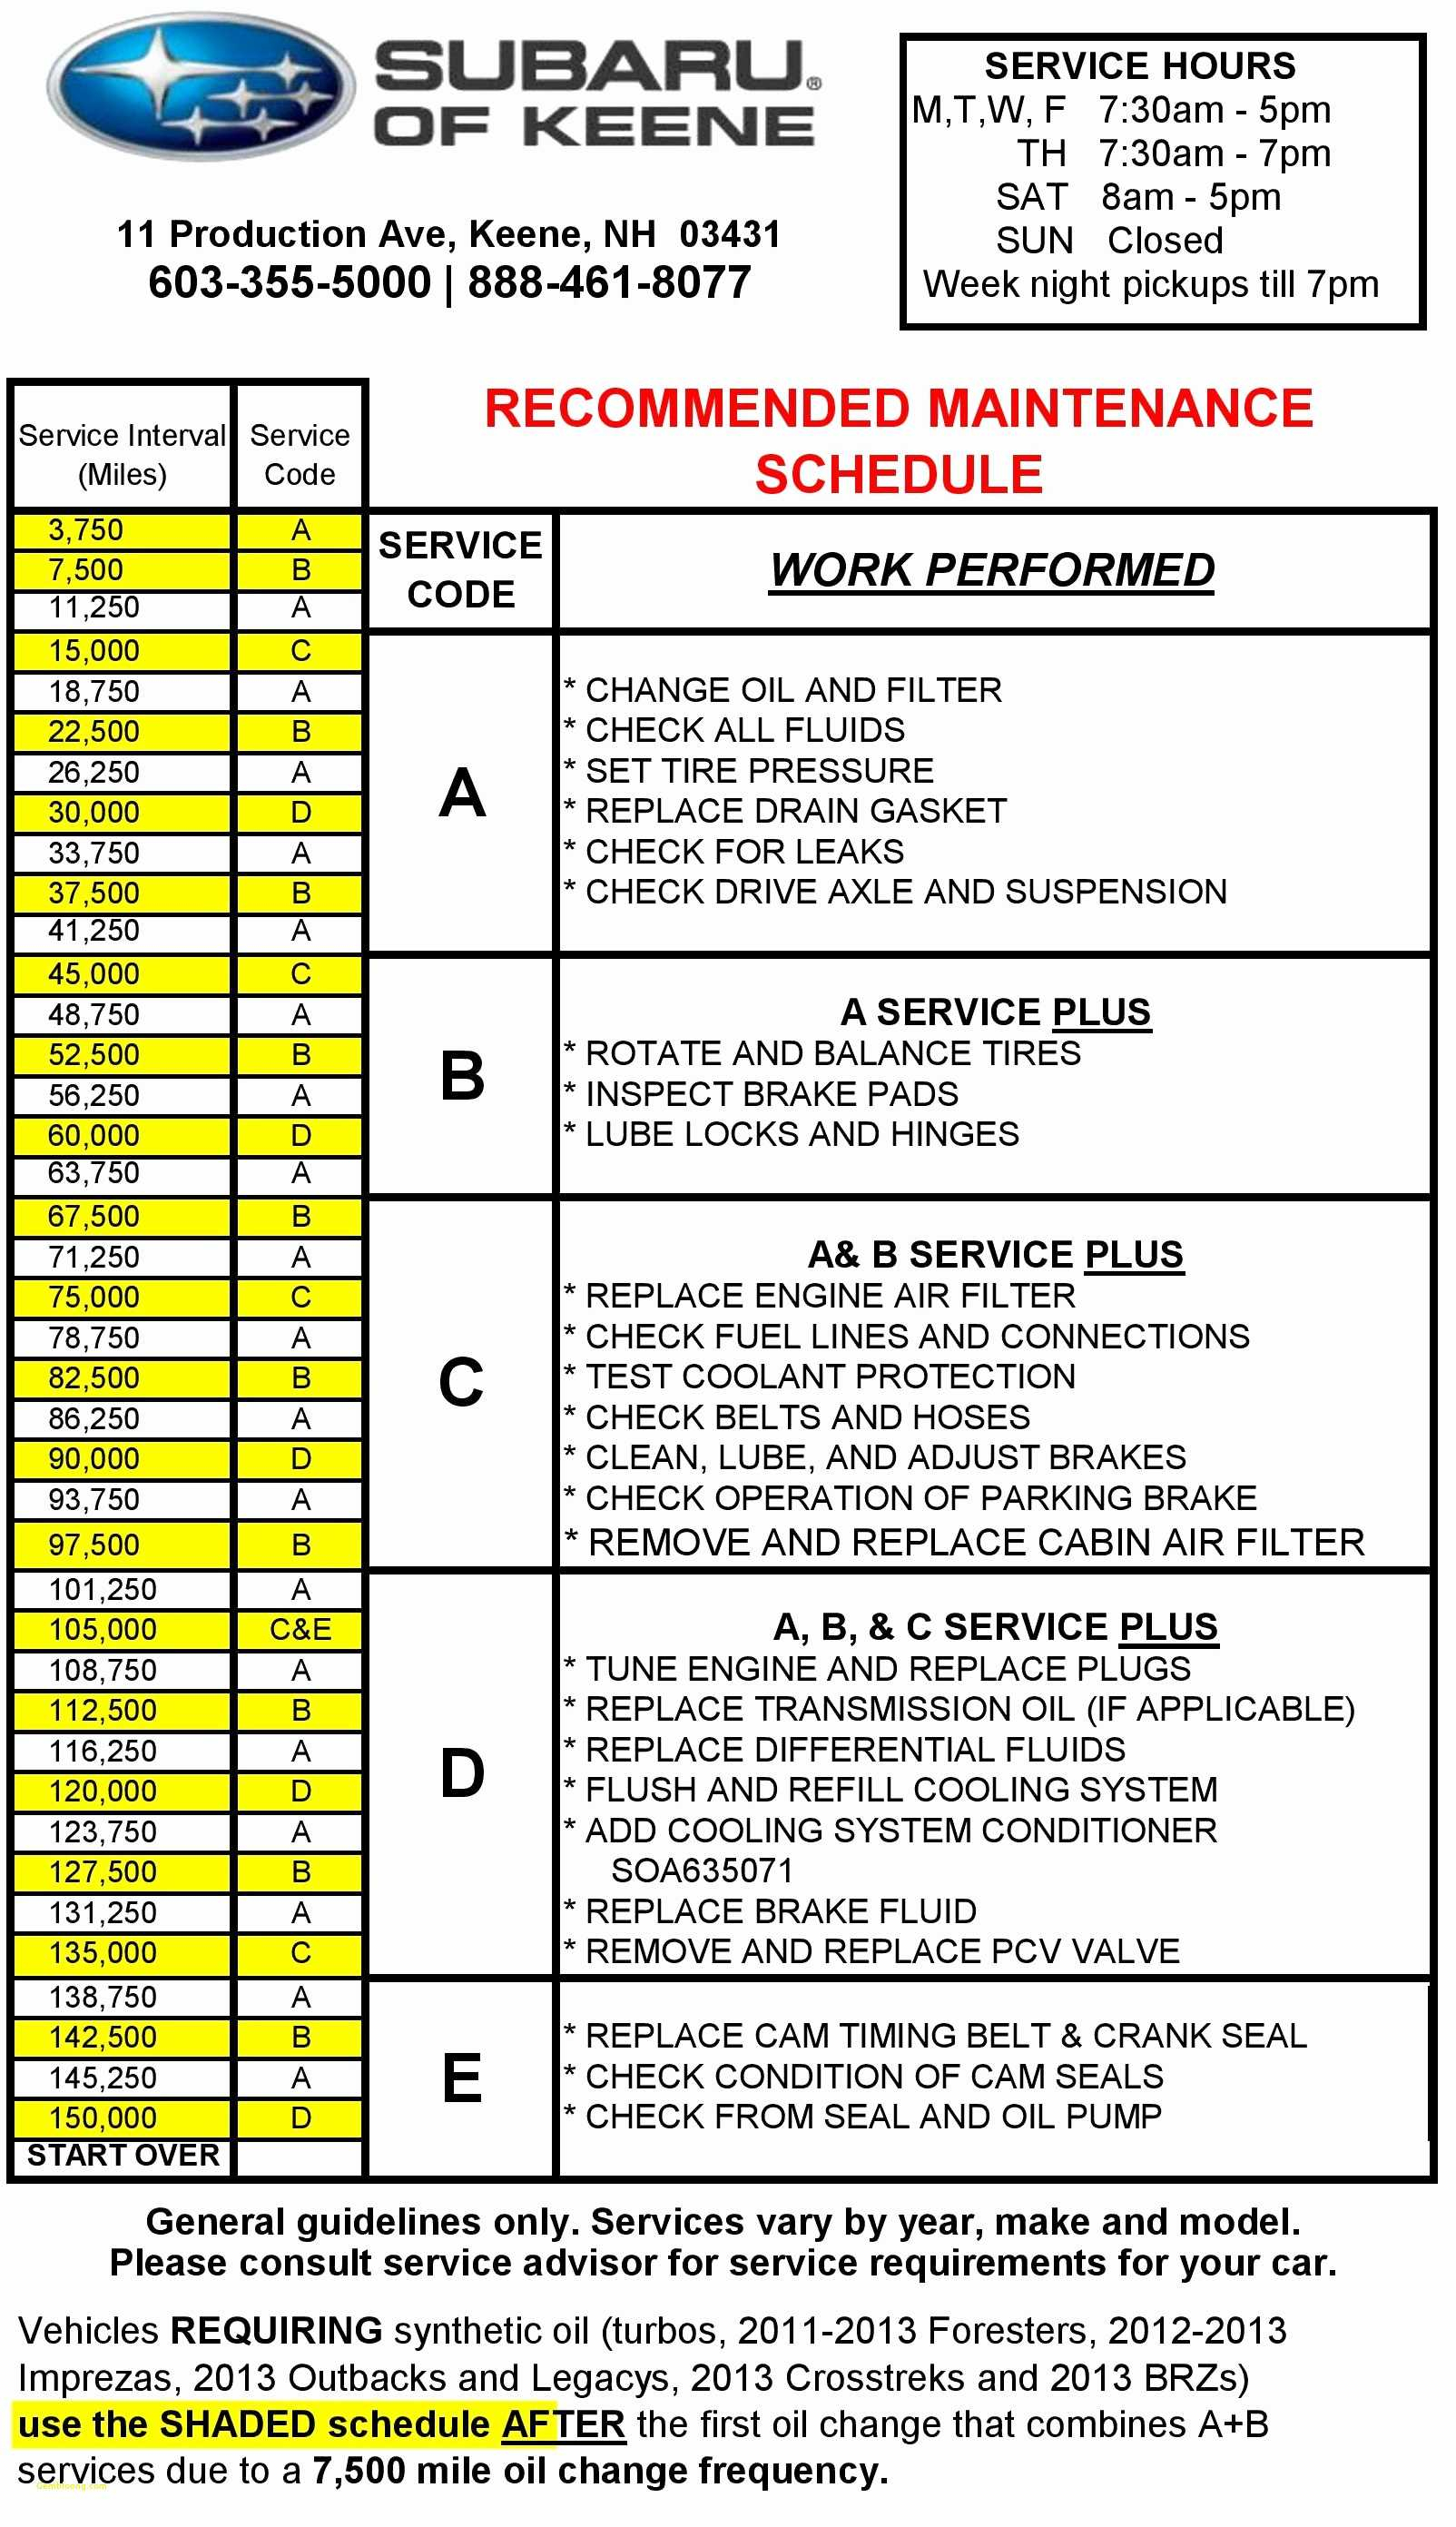 Ashrae 62.1 2013 Ventilation Calculator Spreadsheet Intended For Vehicle Fleet Management Spreadsheet  Awal Mula